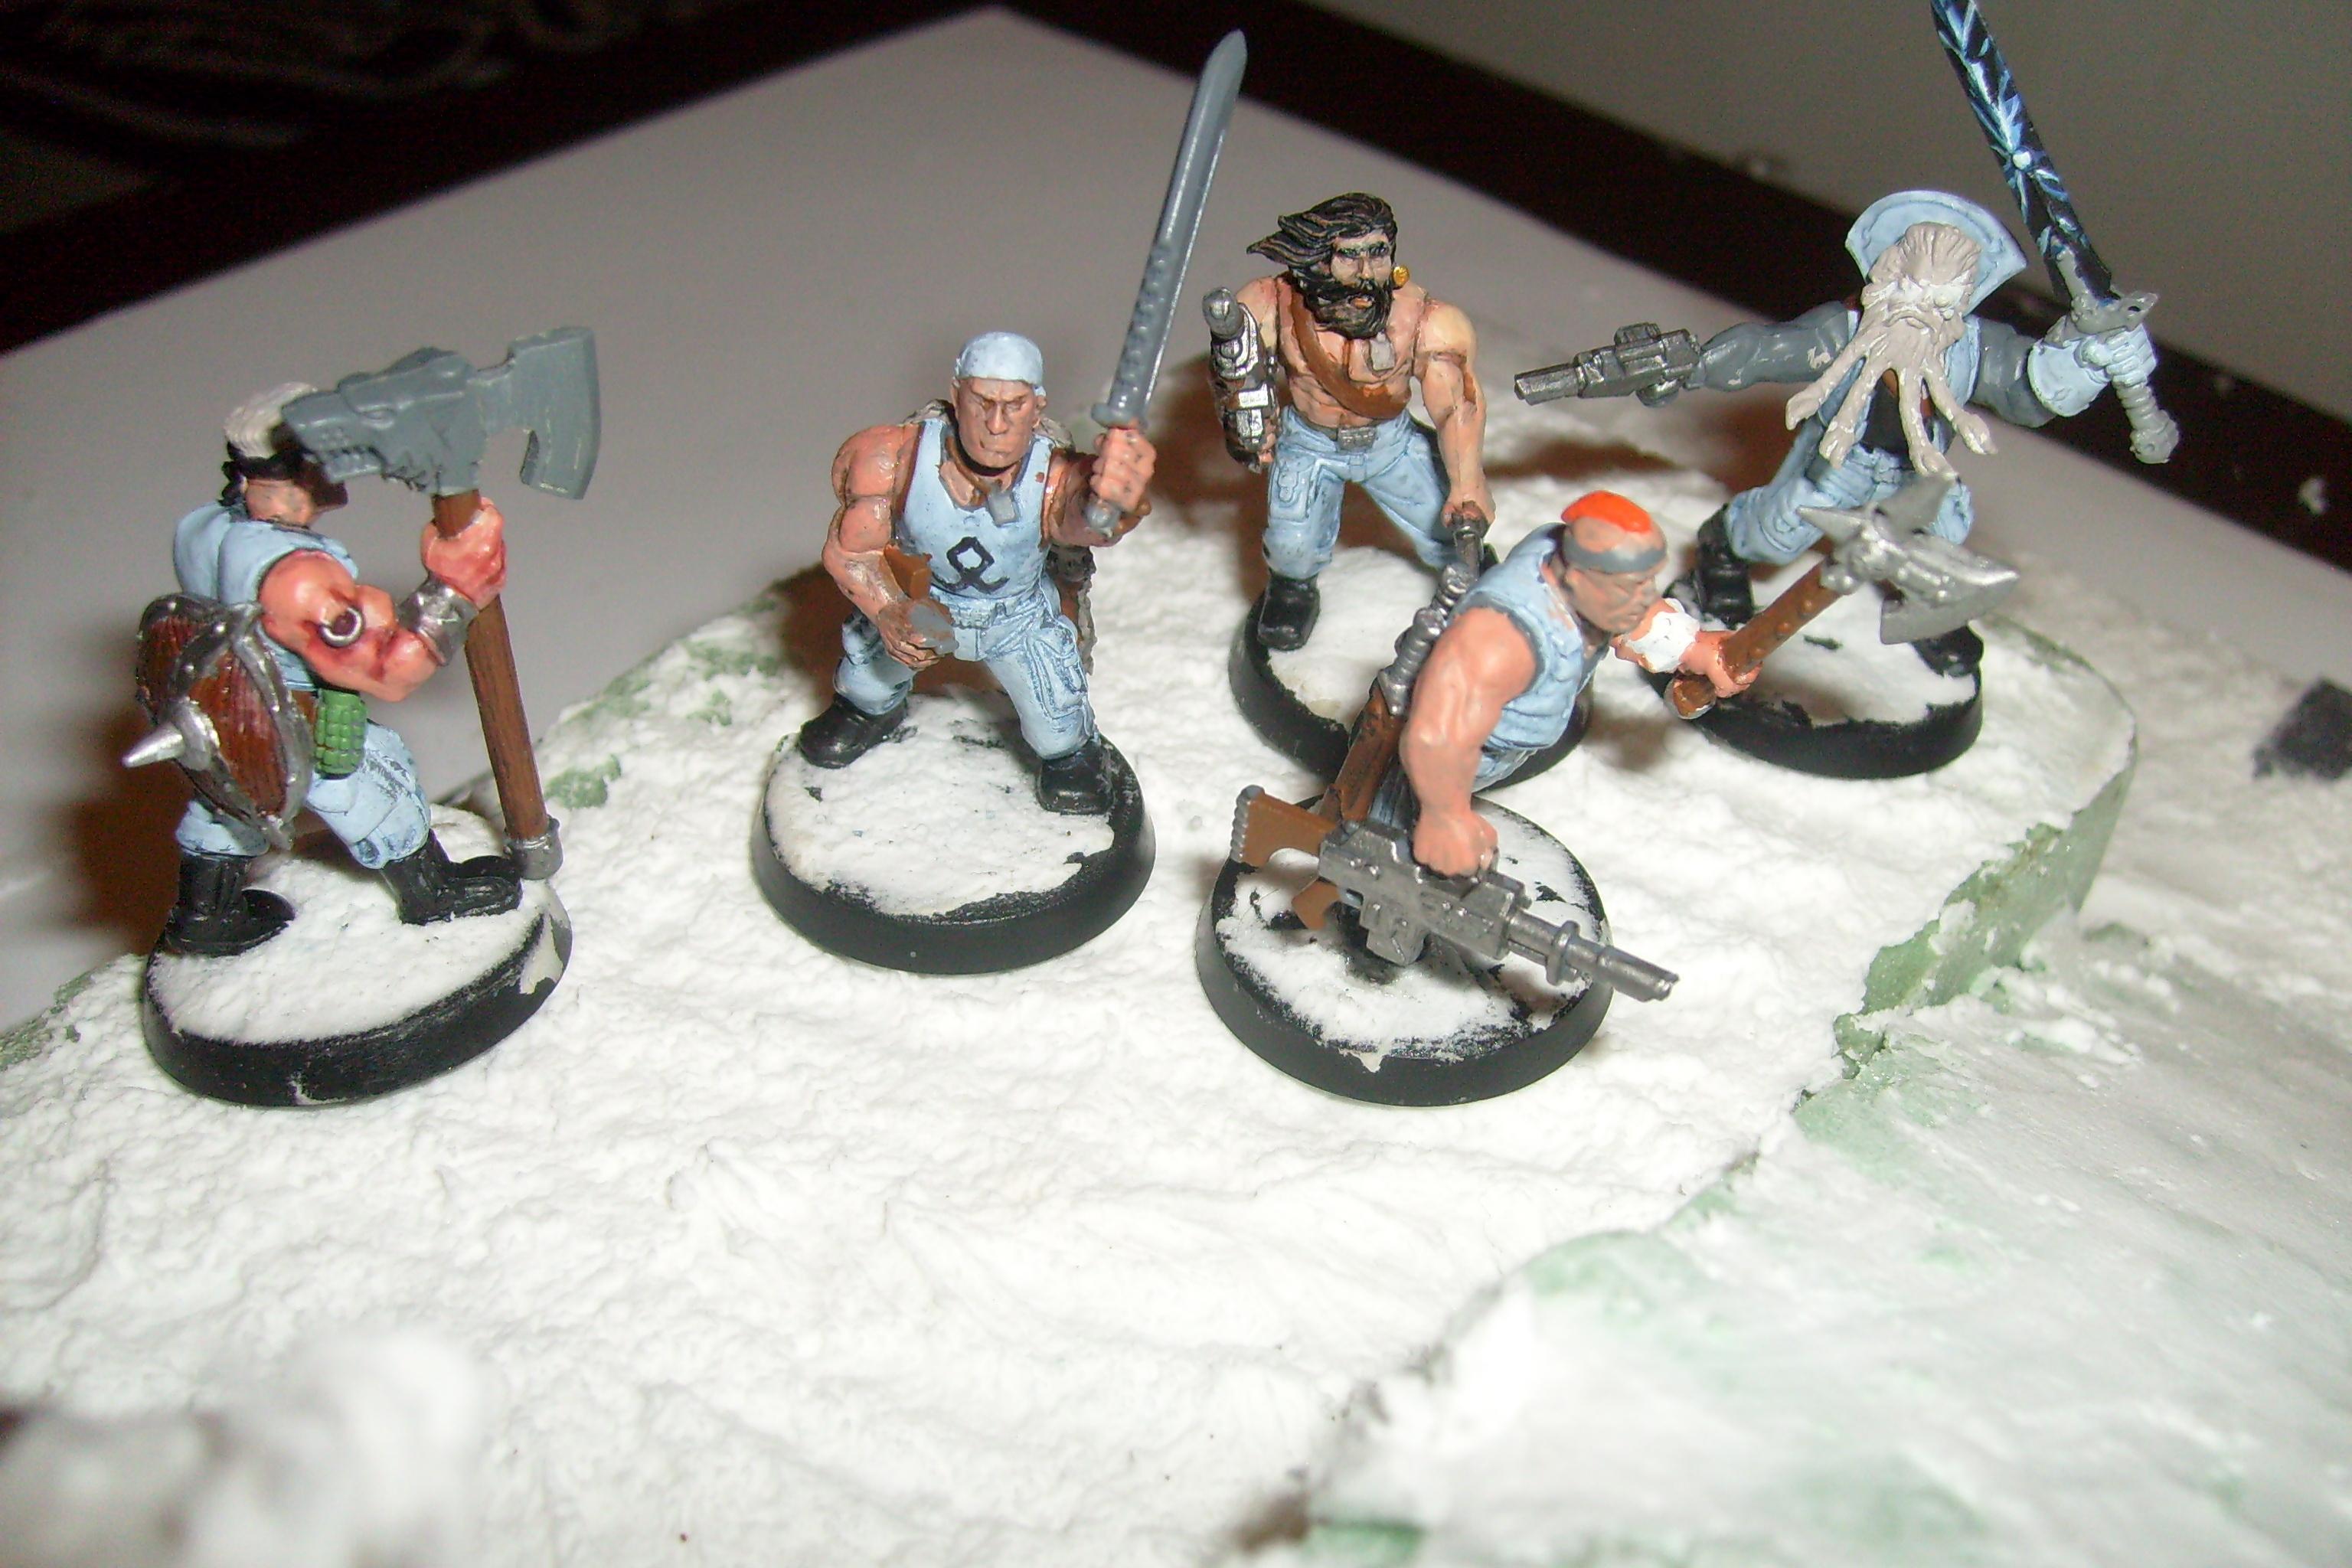 Catachan, Imperial Guard, Pdf, Space Wolves, Spacewolves Fenrisian, Wolves